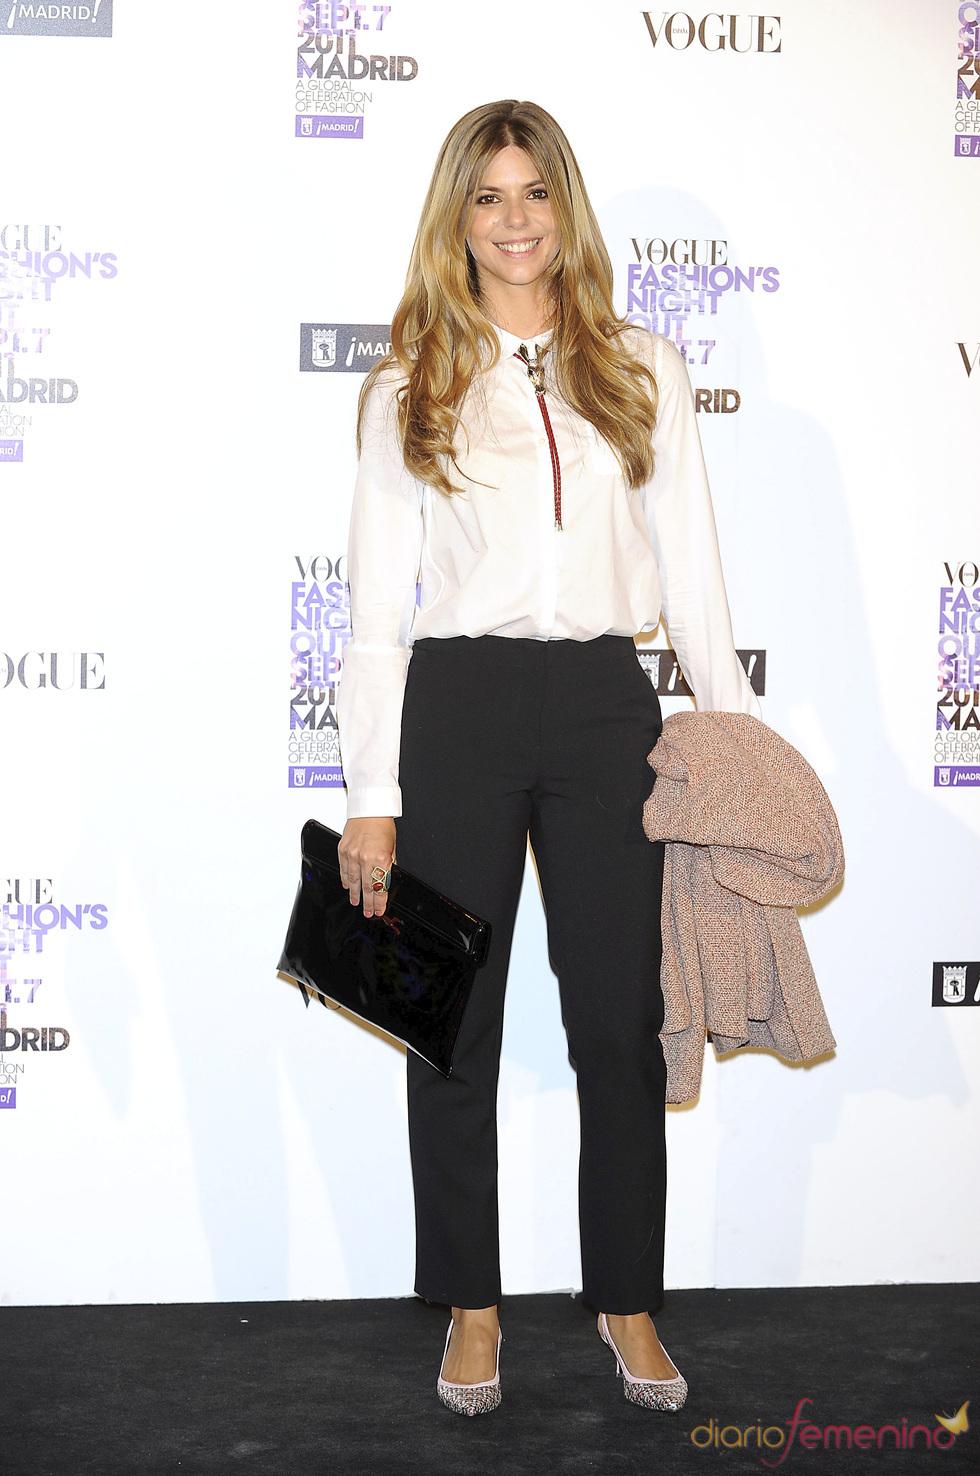 Manuela Velasco durante la Vogue Fashion Night Out Madrid 2011